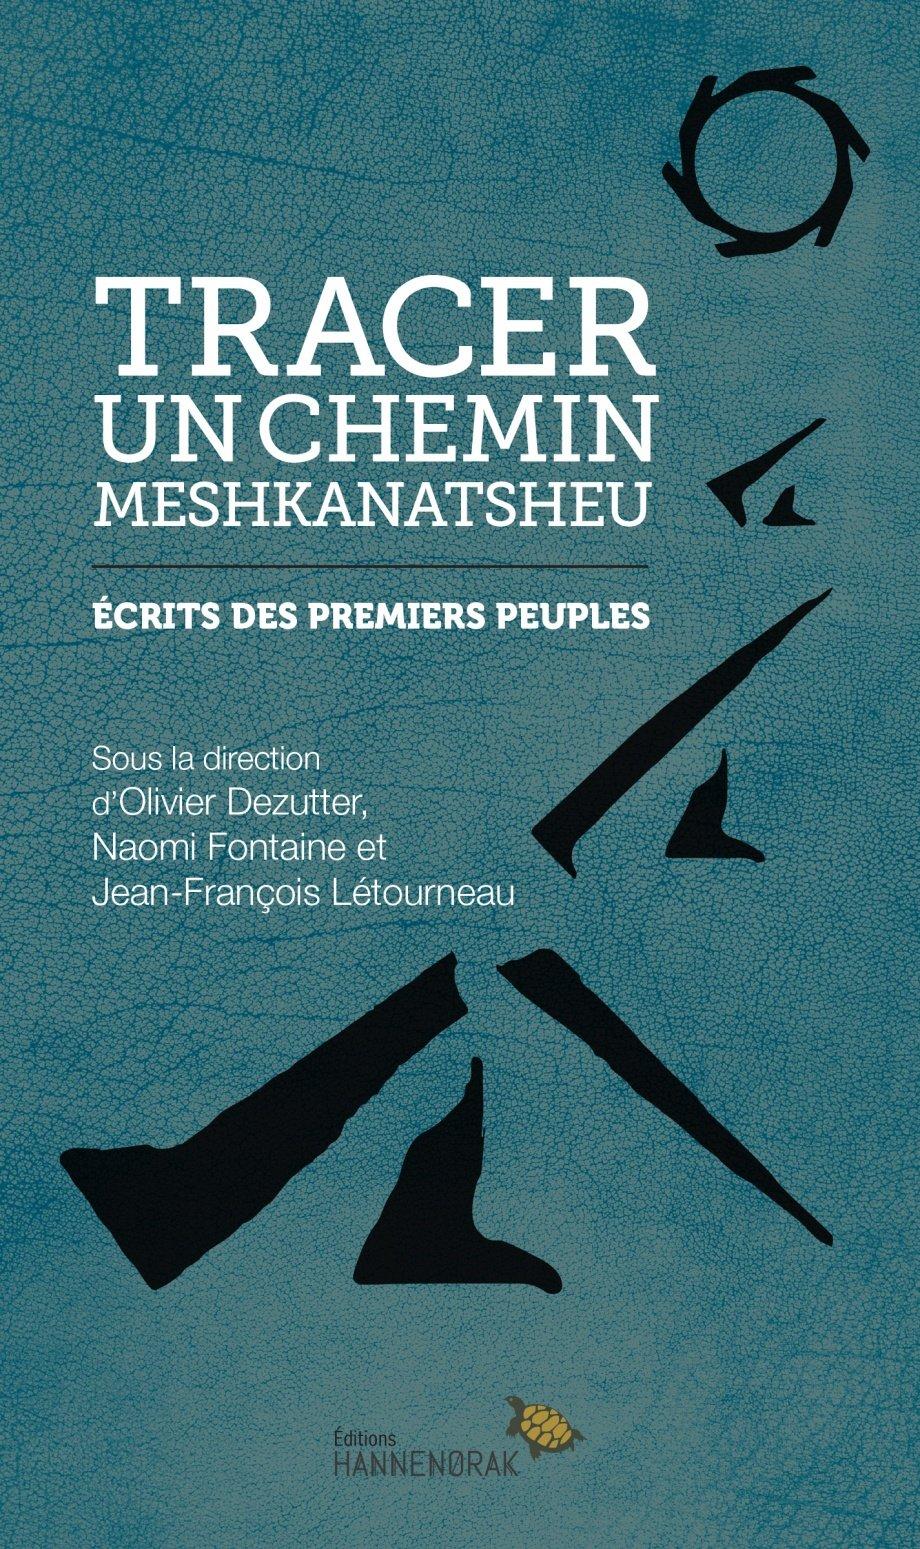 Tracer un chemin - Meshkanatsheu, un recueil de Hannenorak